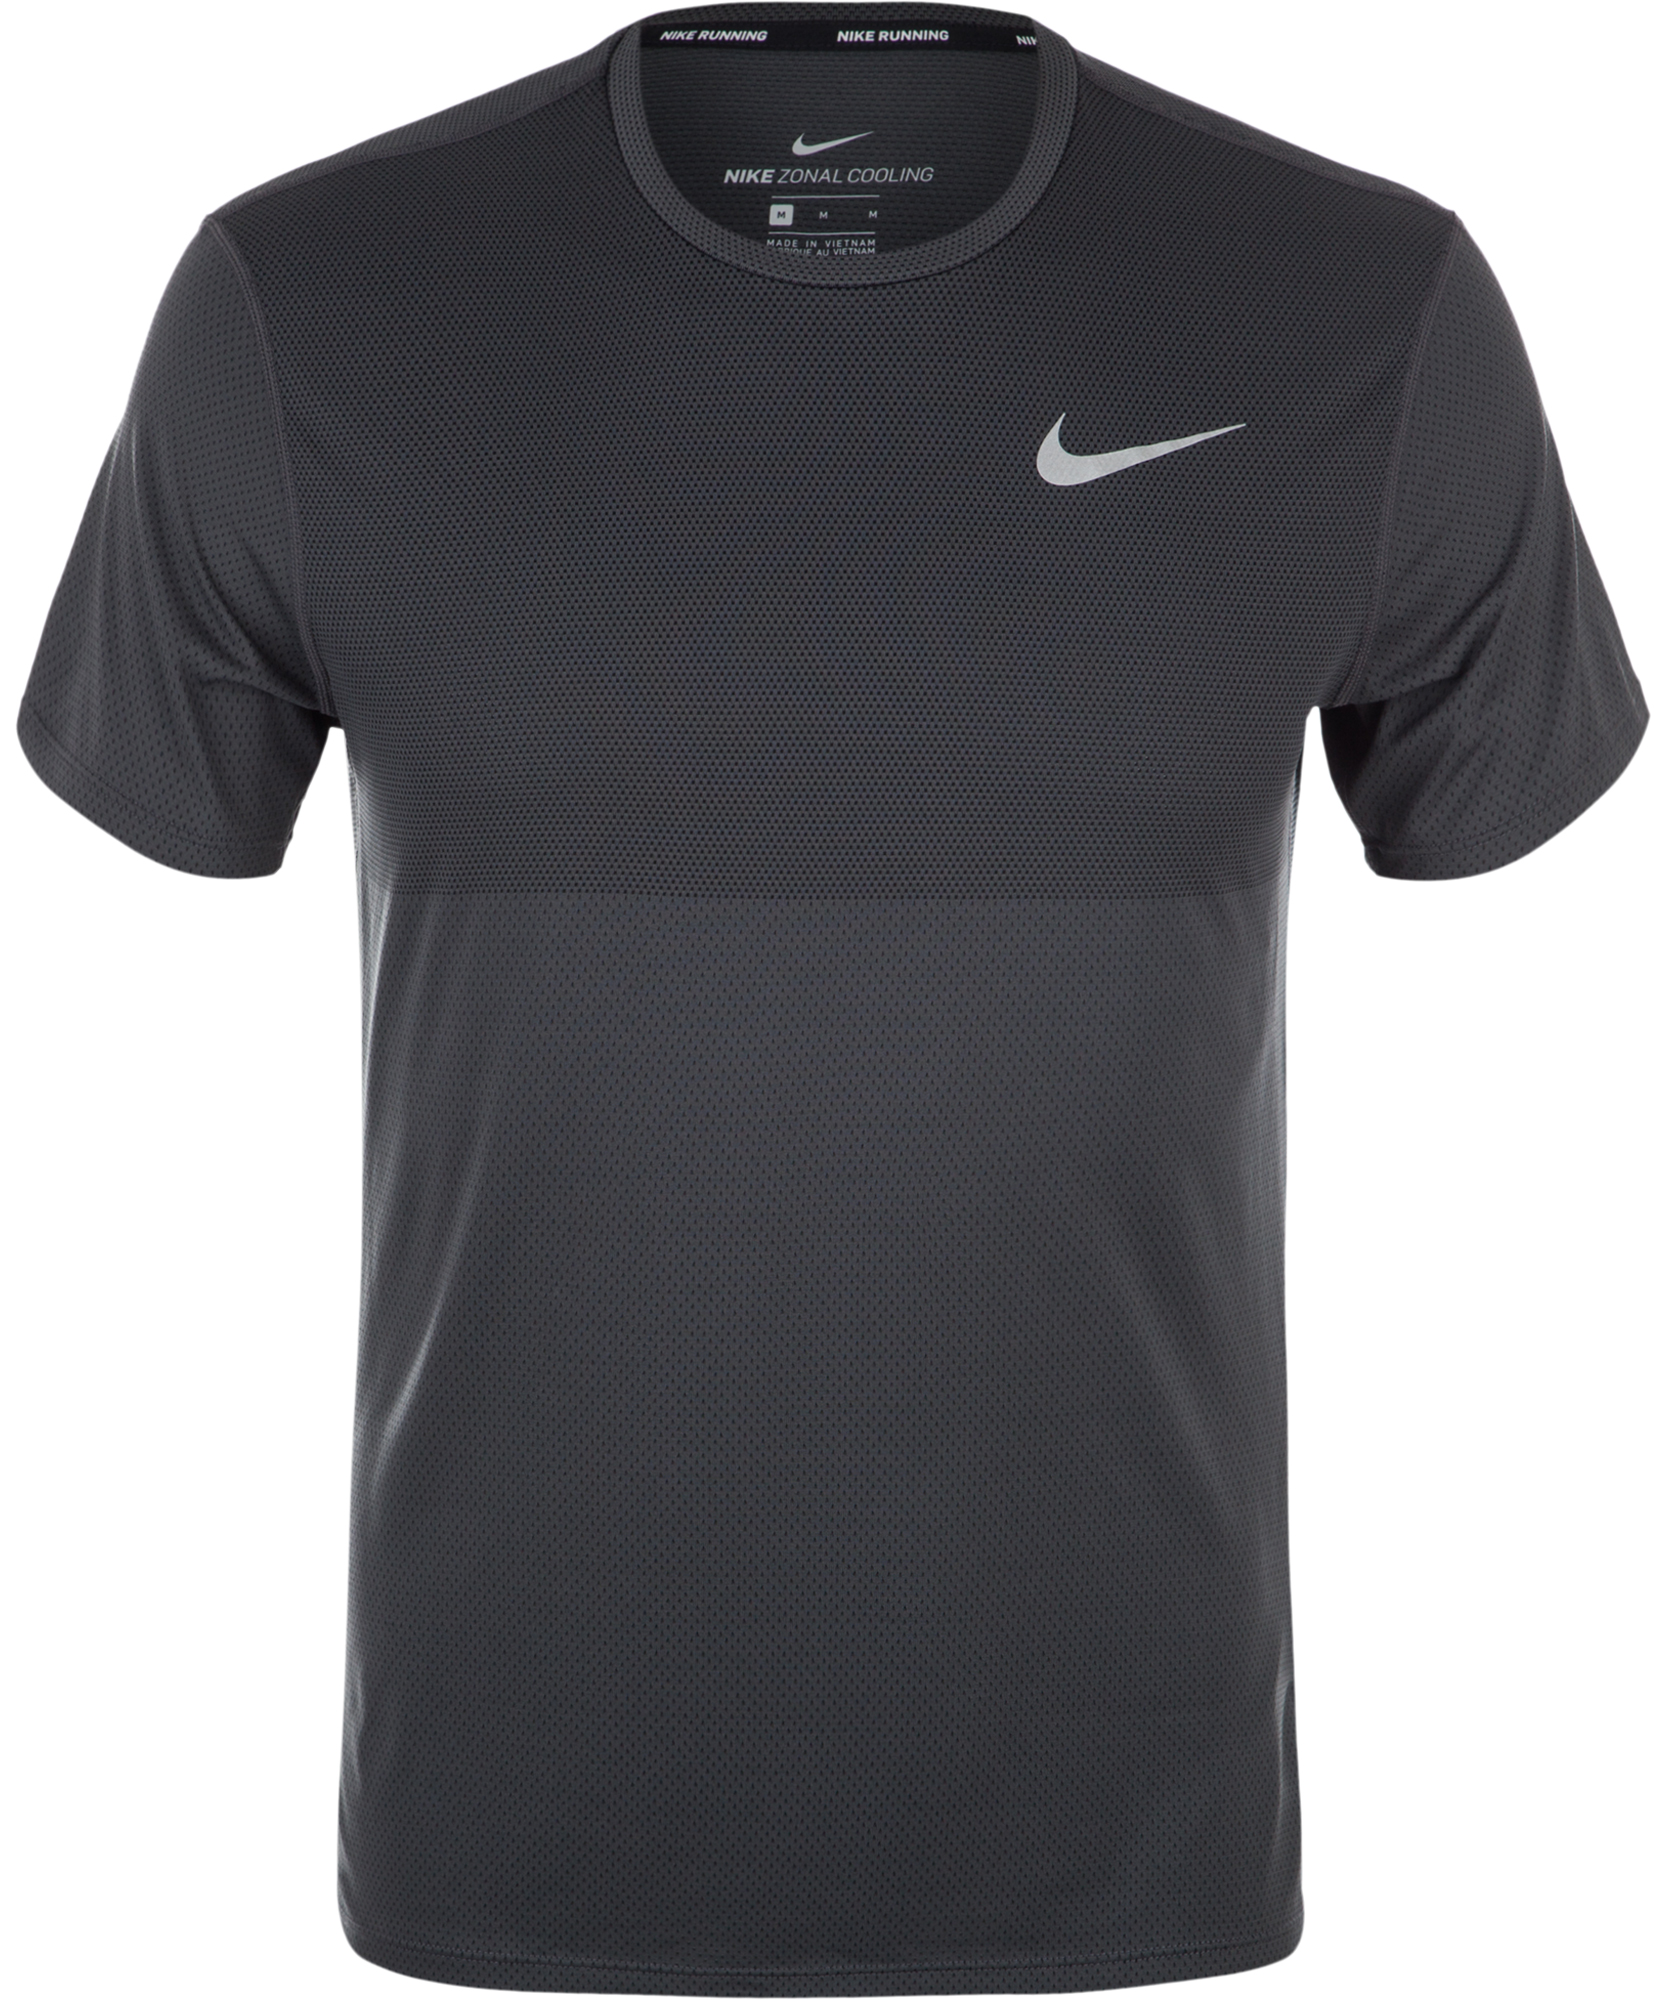 Nike Футболка мужская Nike Relay nike футболка с длинным рукавом мужская nike